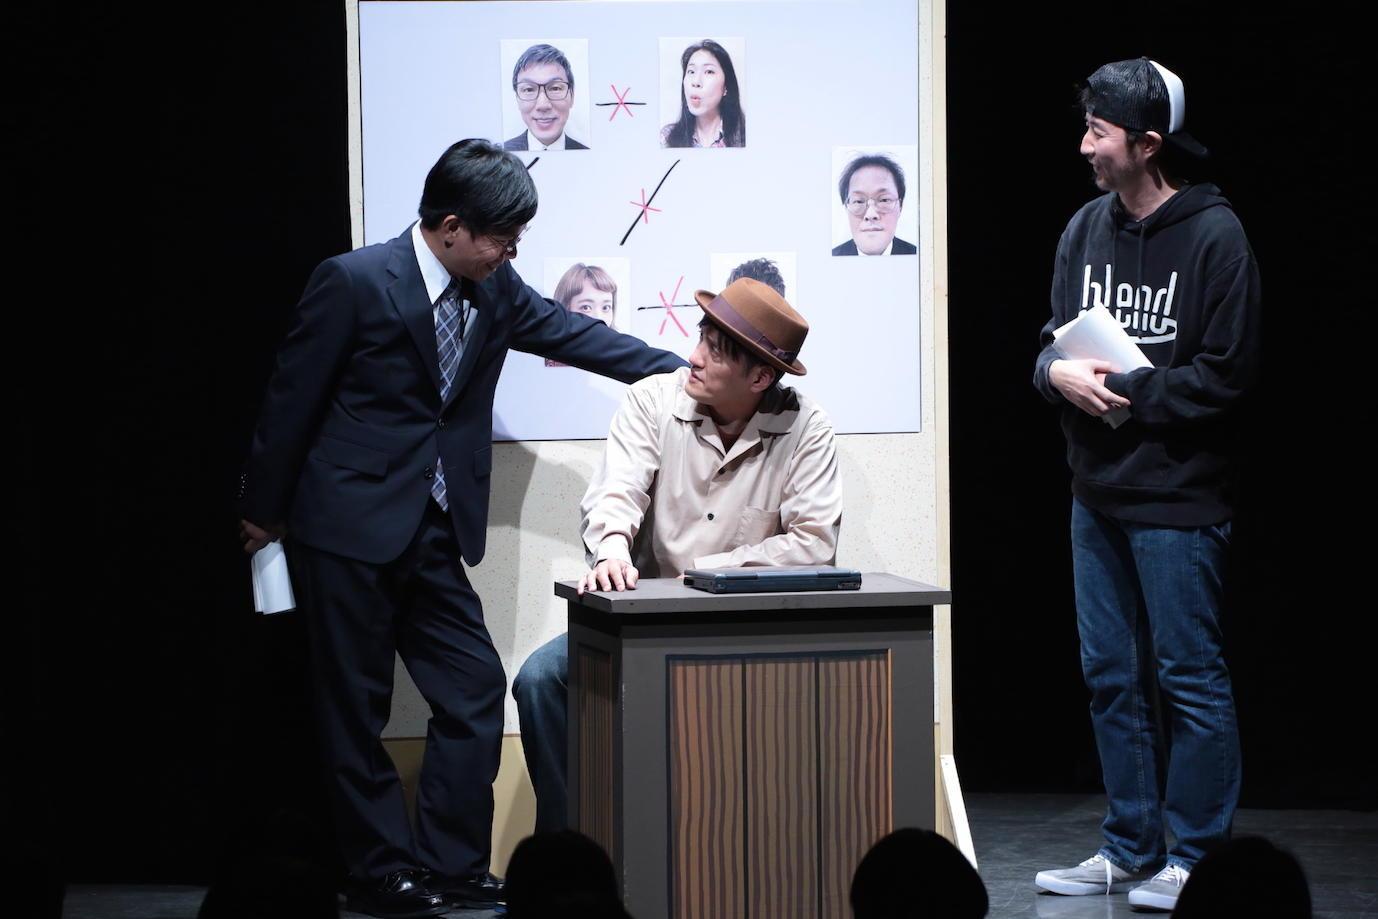 http://news.yoshimoto.co.jp/20180929112103-01e9243c4a22fa2978accf165cd0efb69bb79efc.jpg